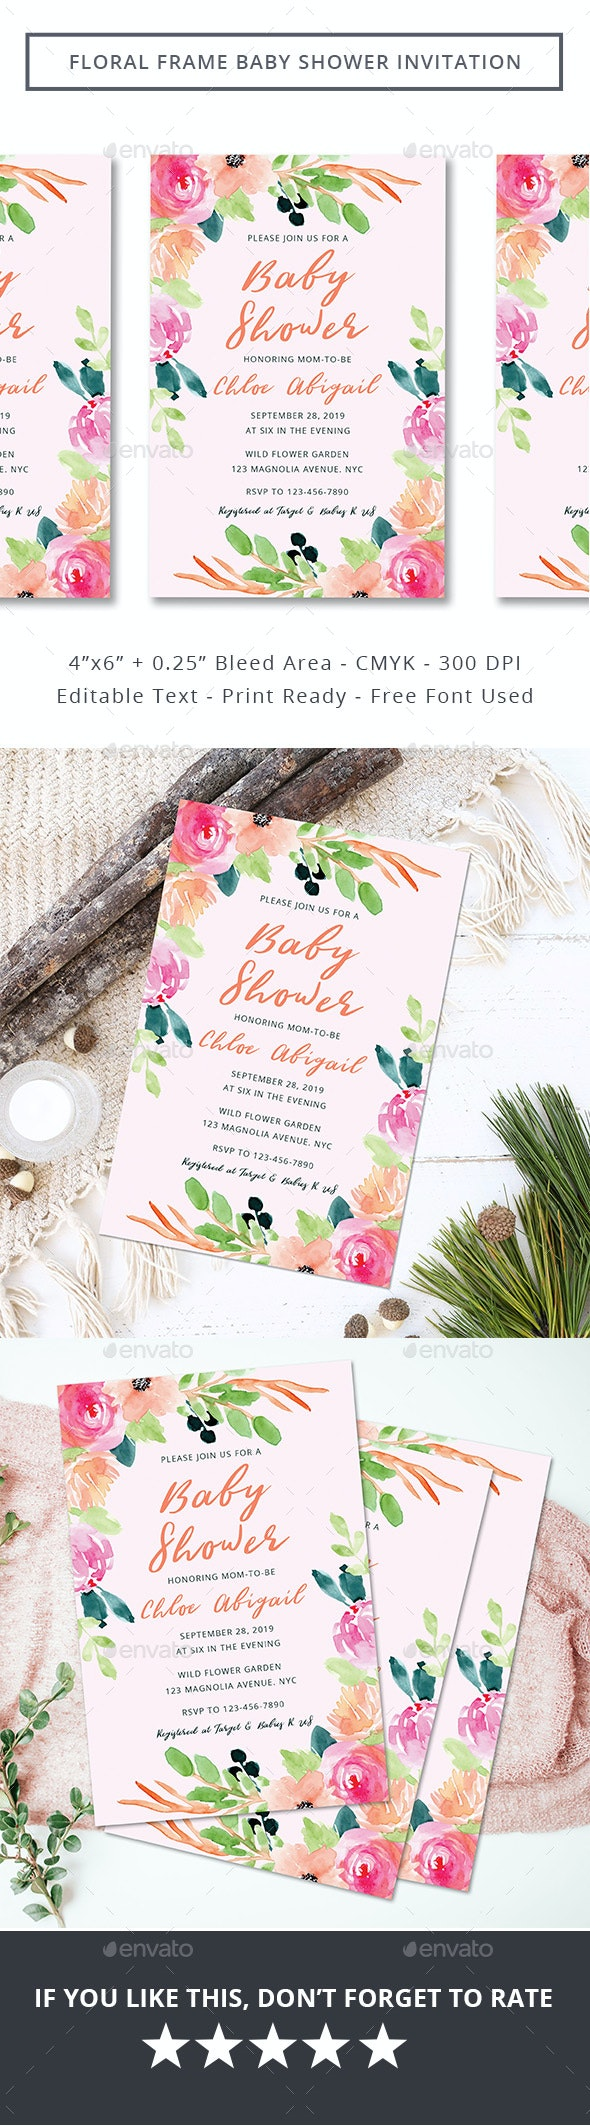 Floral Frame Baby Shower Invitation - Invitations Cards & Invites